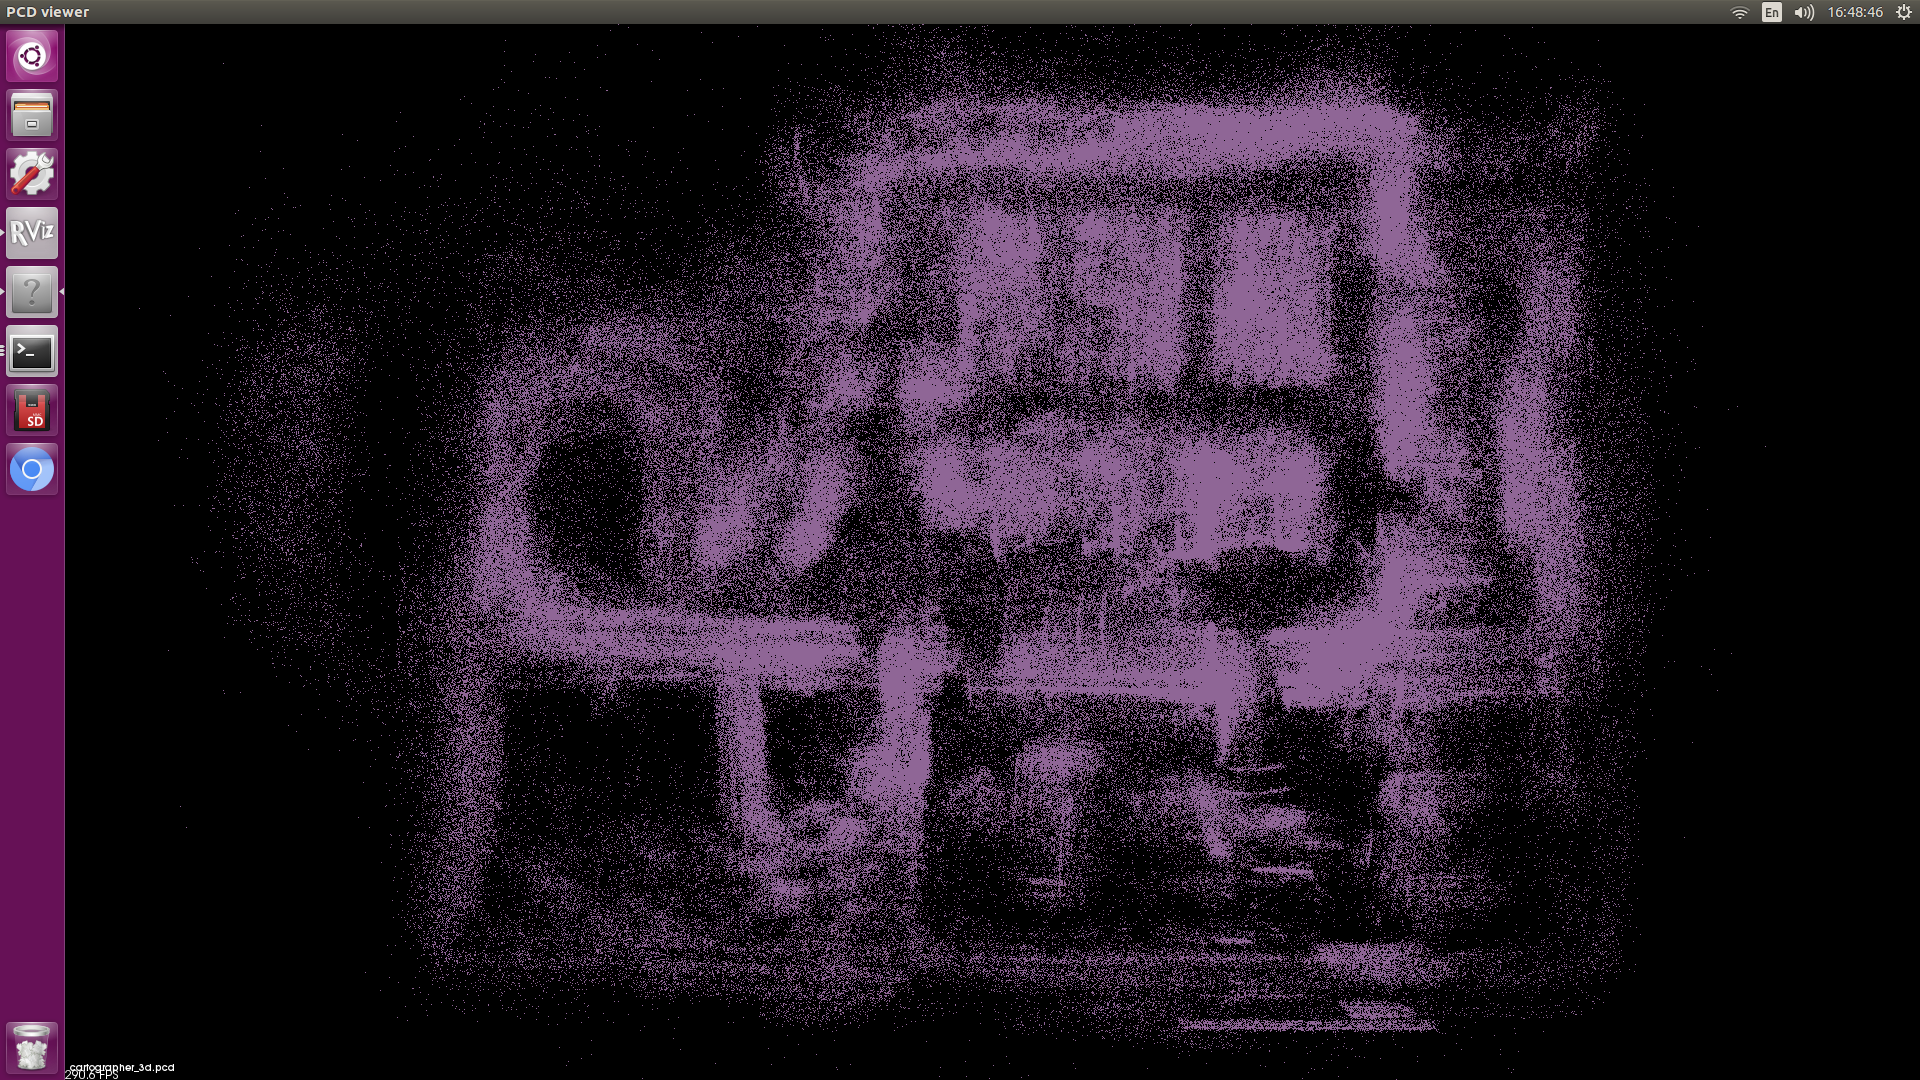 Turbot-SLAM入门教程-实现cartographer 3D建图(多线雷达rslidar